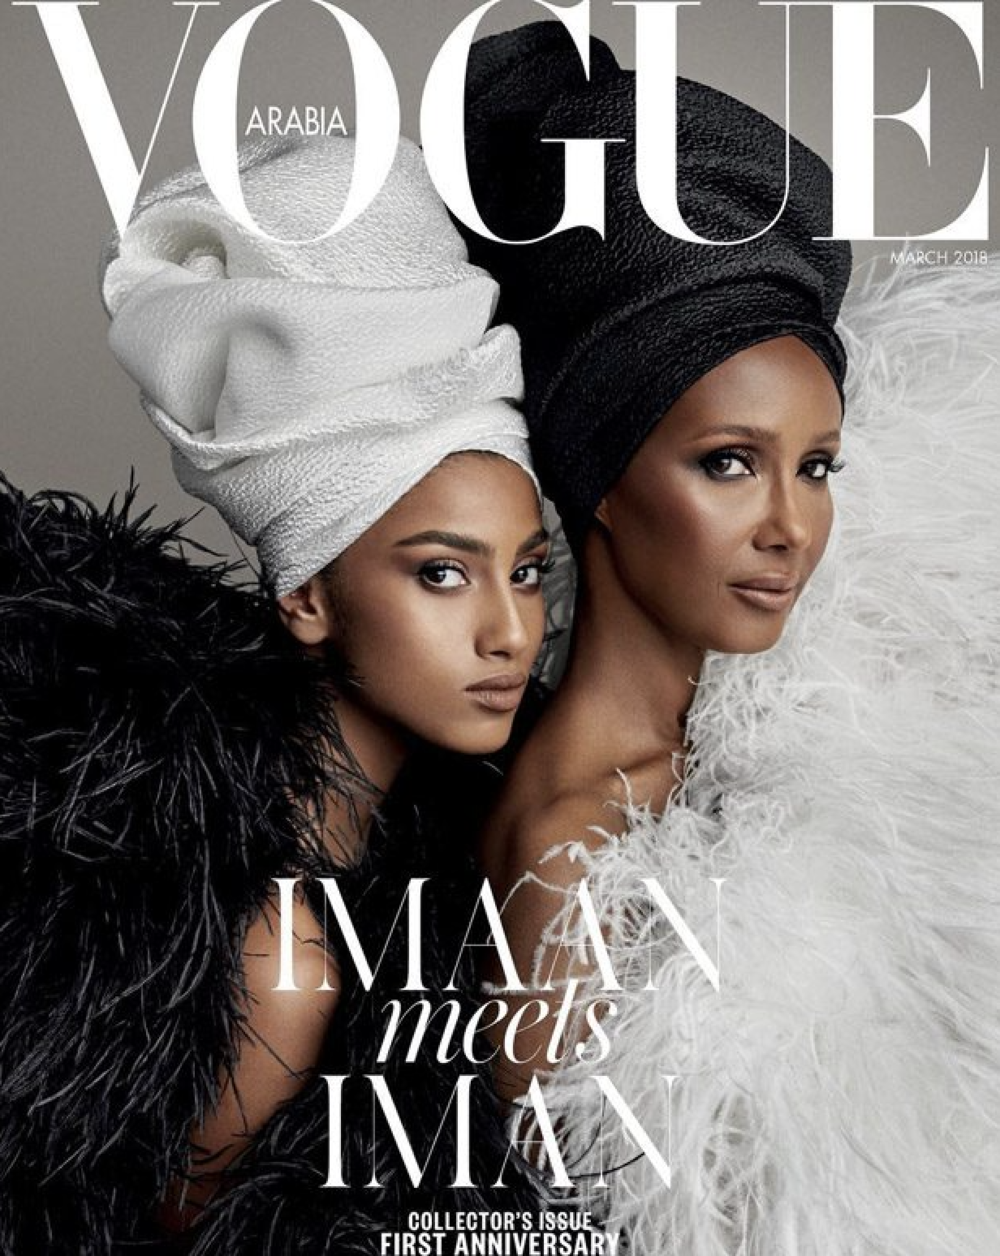 Vogue Arabia Cover